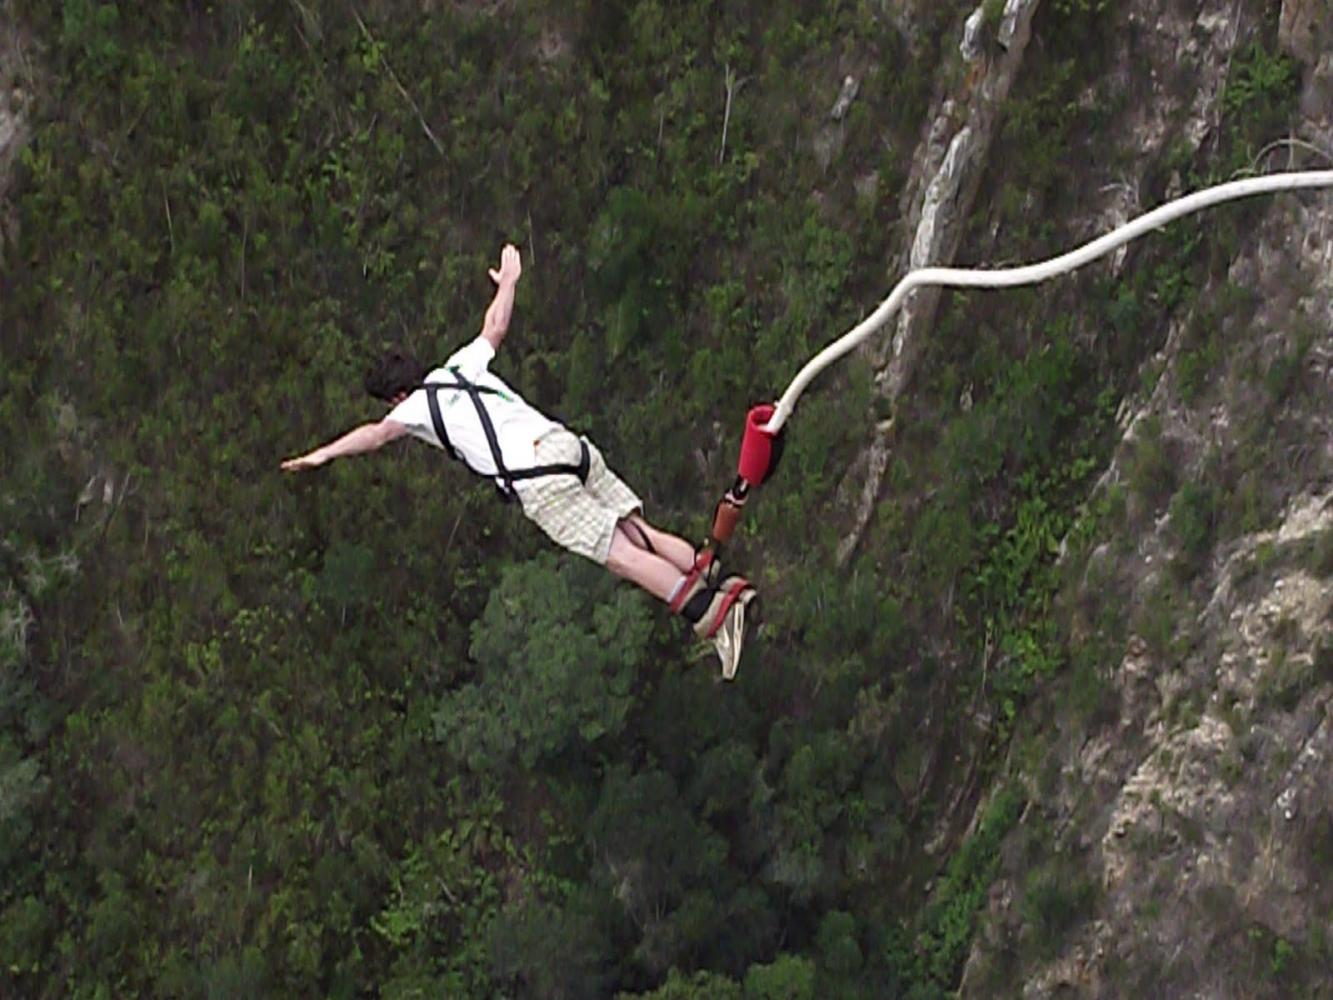 Bungee jumping photos 33